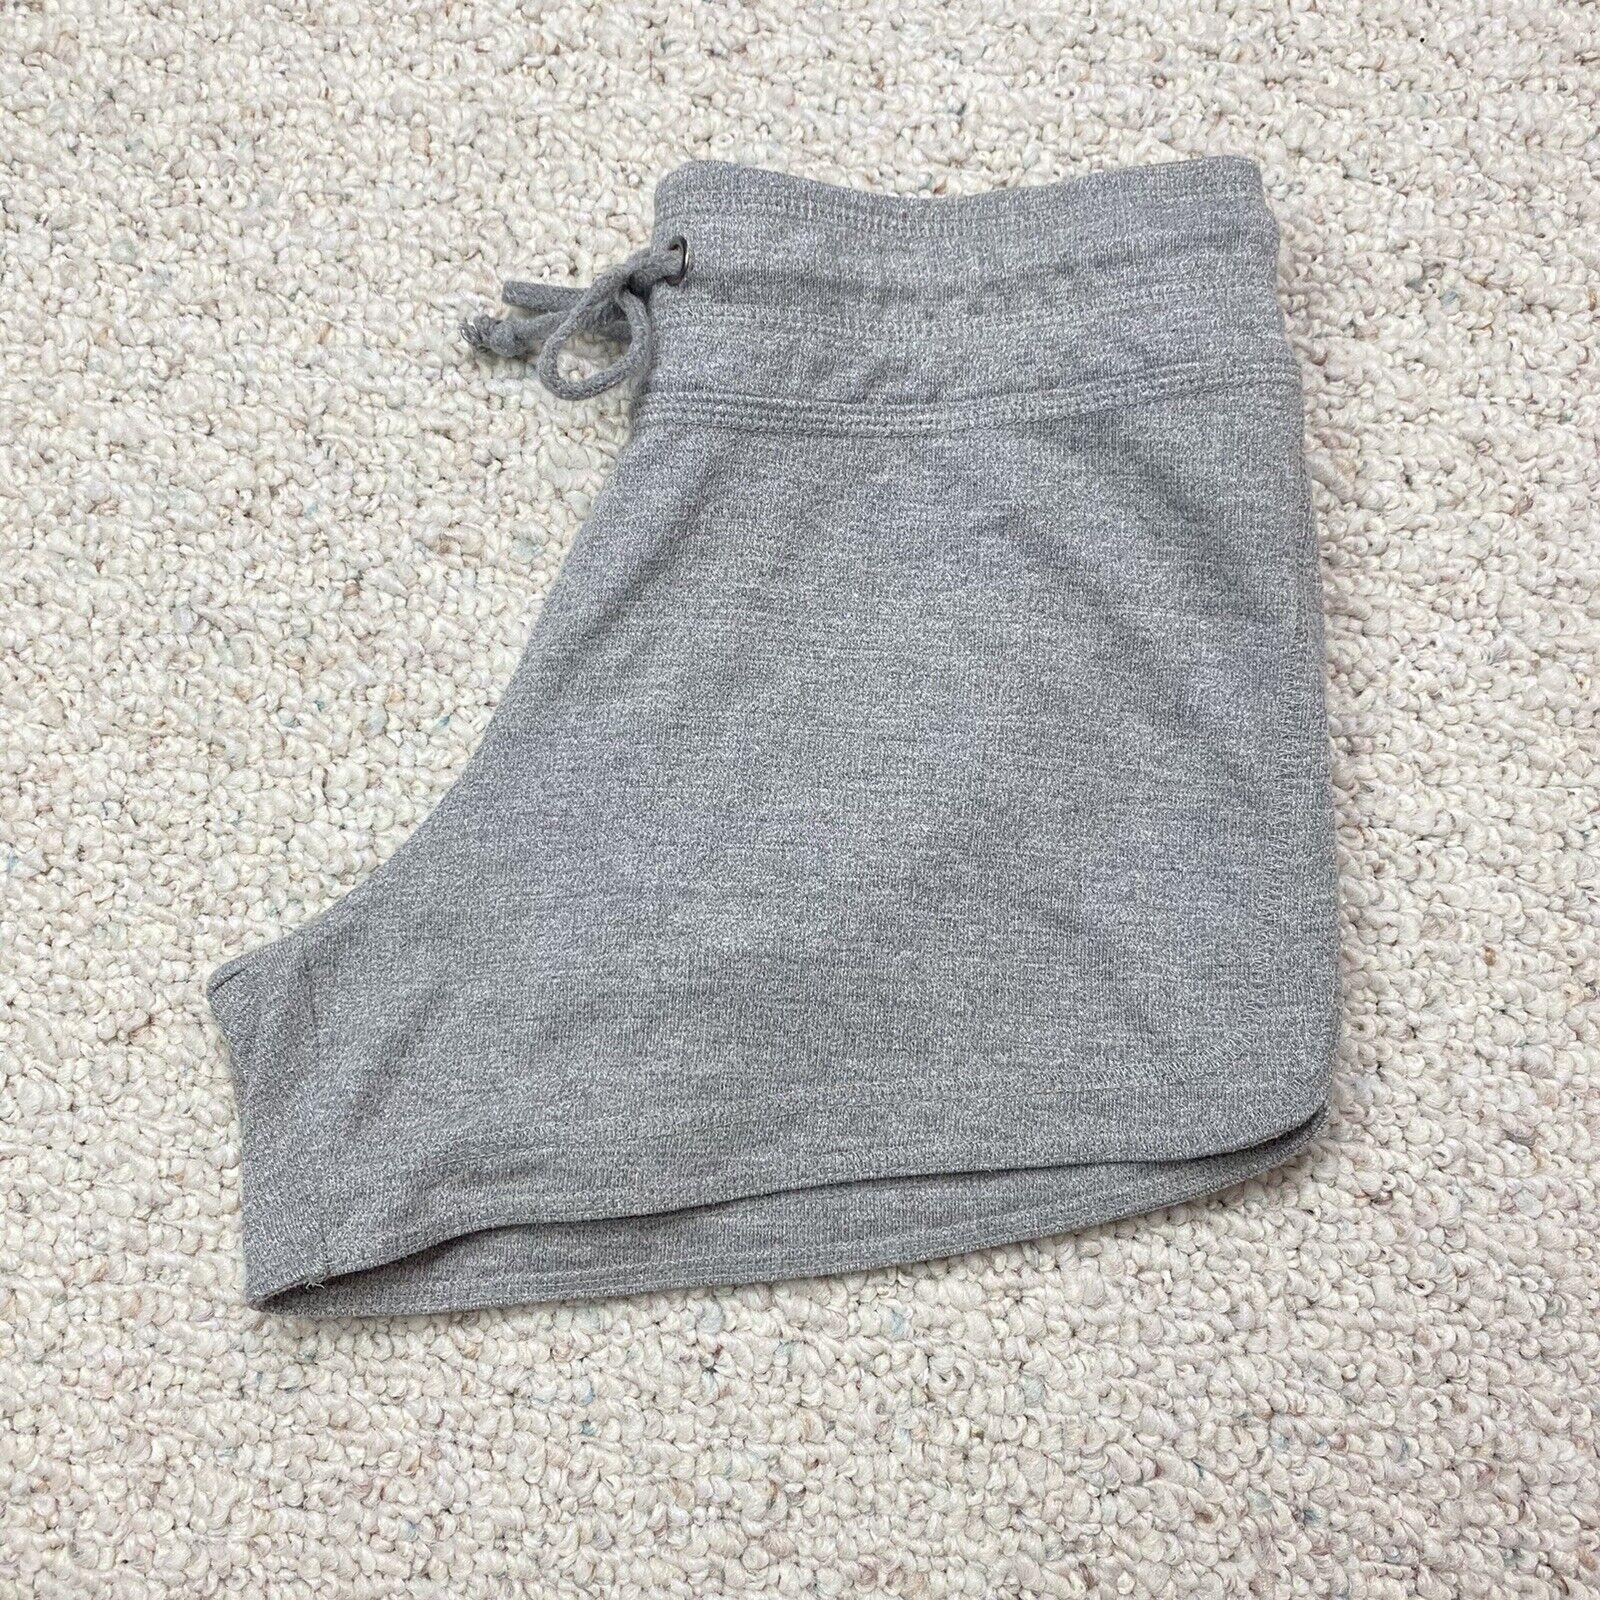 Harmony & Balance Womens Active Shorts sz S Light Gray Elastic Waist Lightweight